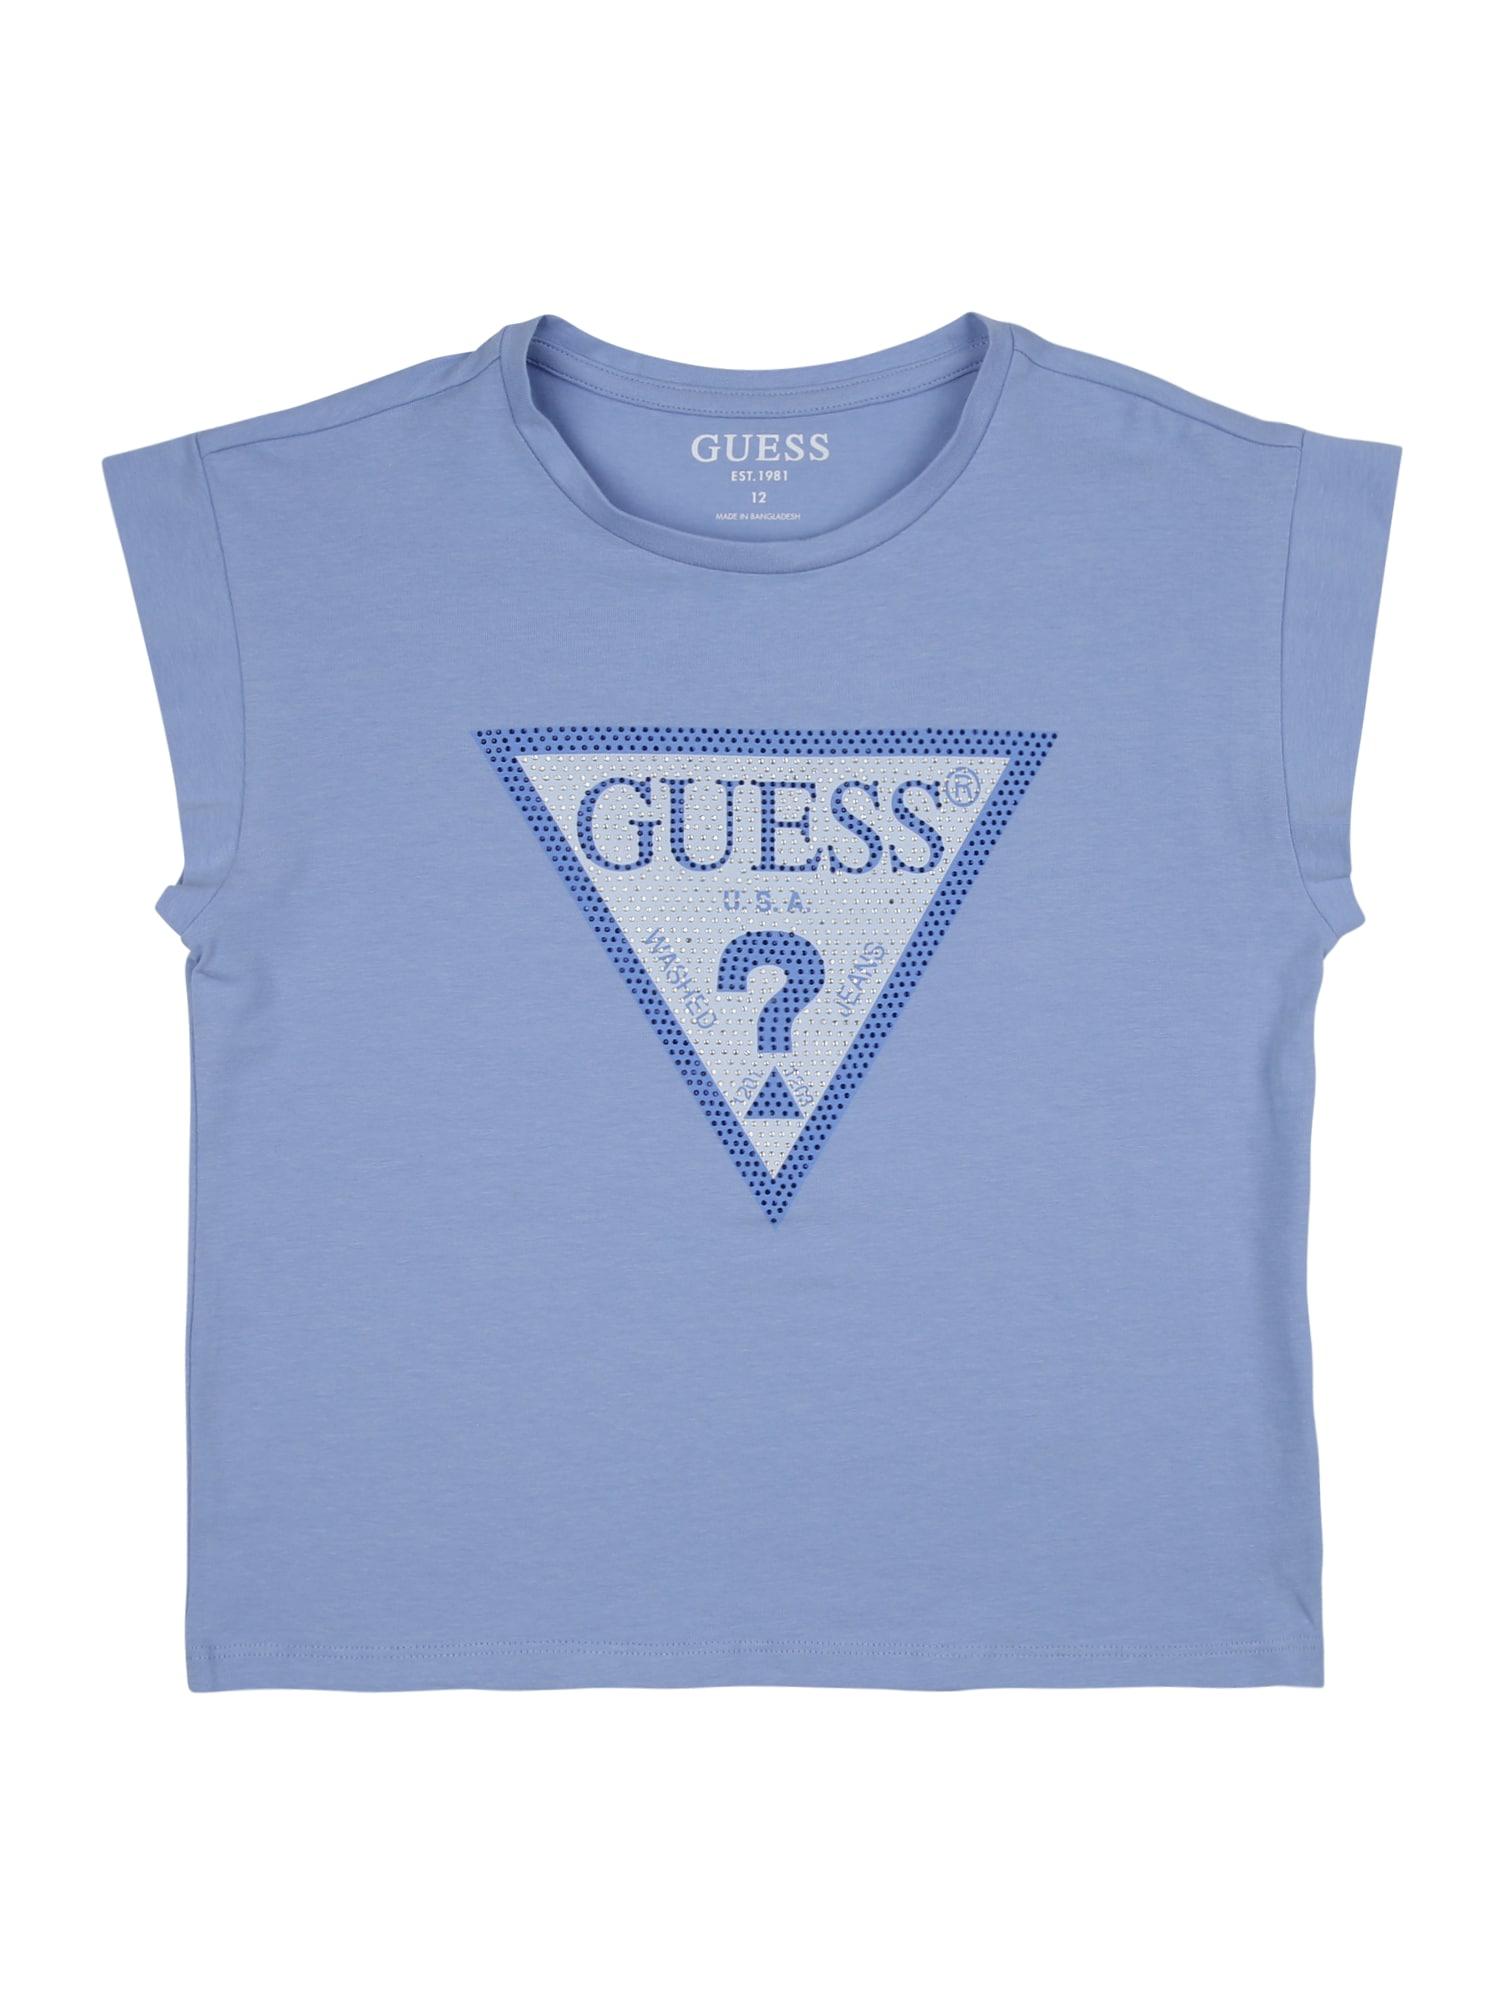 GUESS KIDS Marškinėliai mėlyna / balta / šviesiai mėlyna